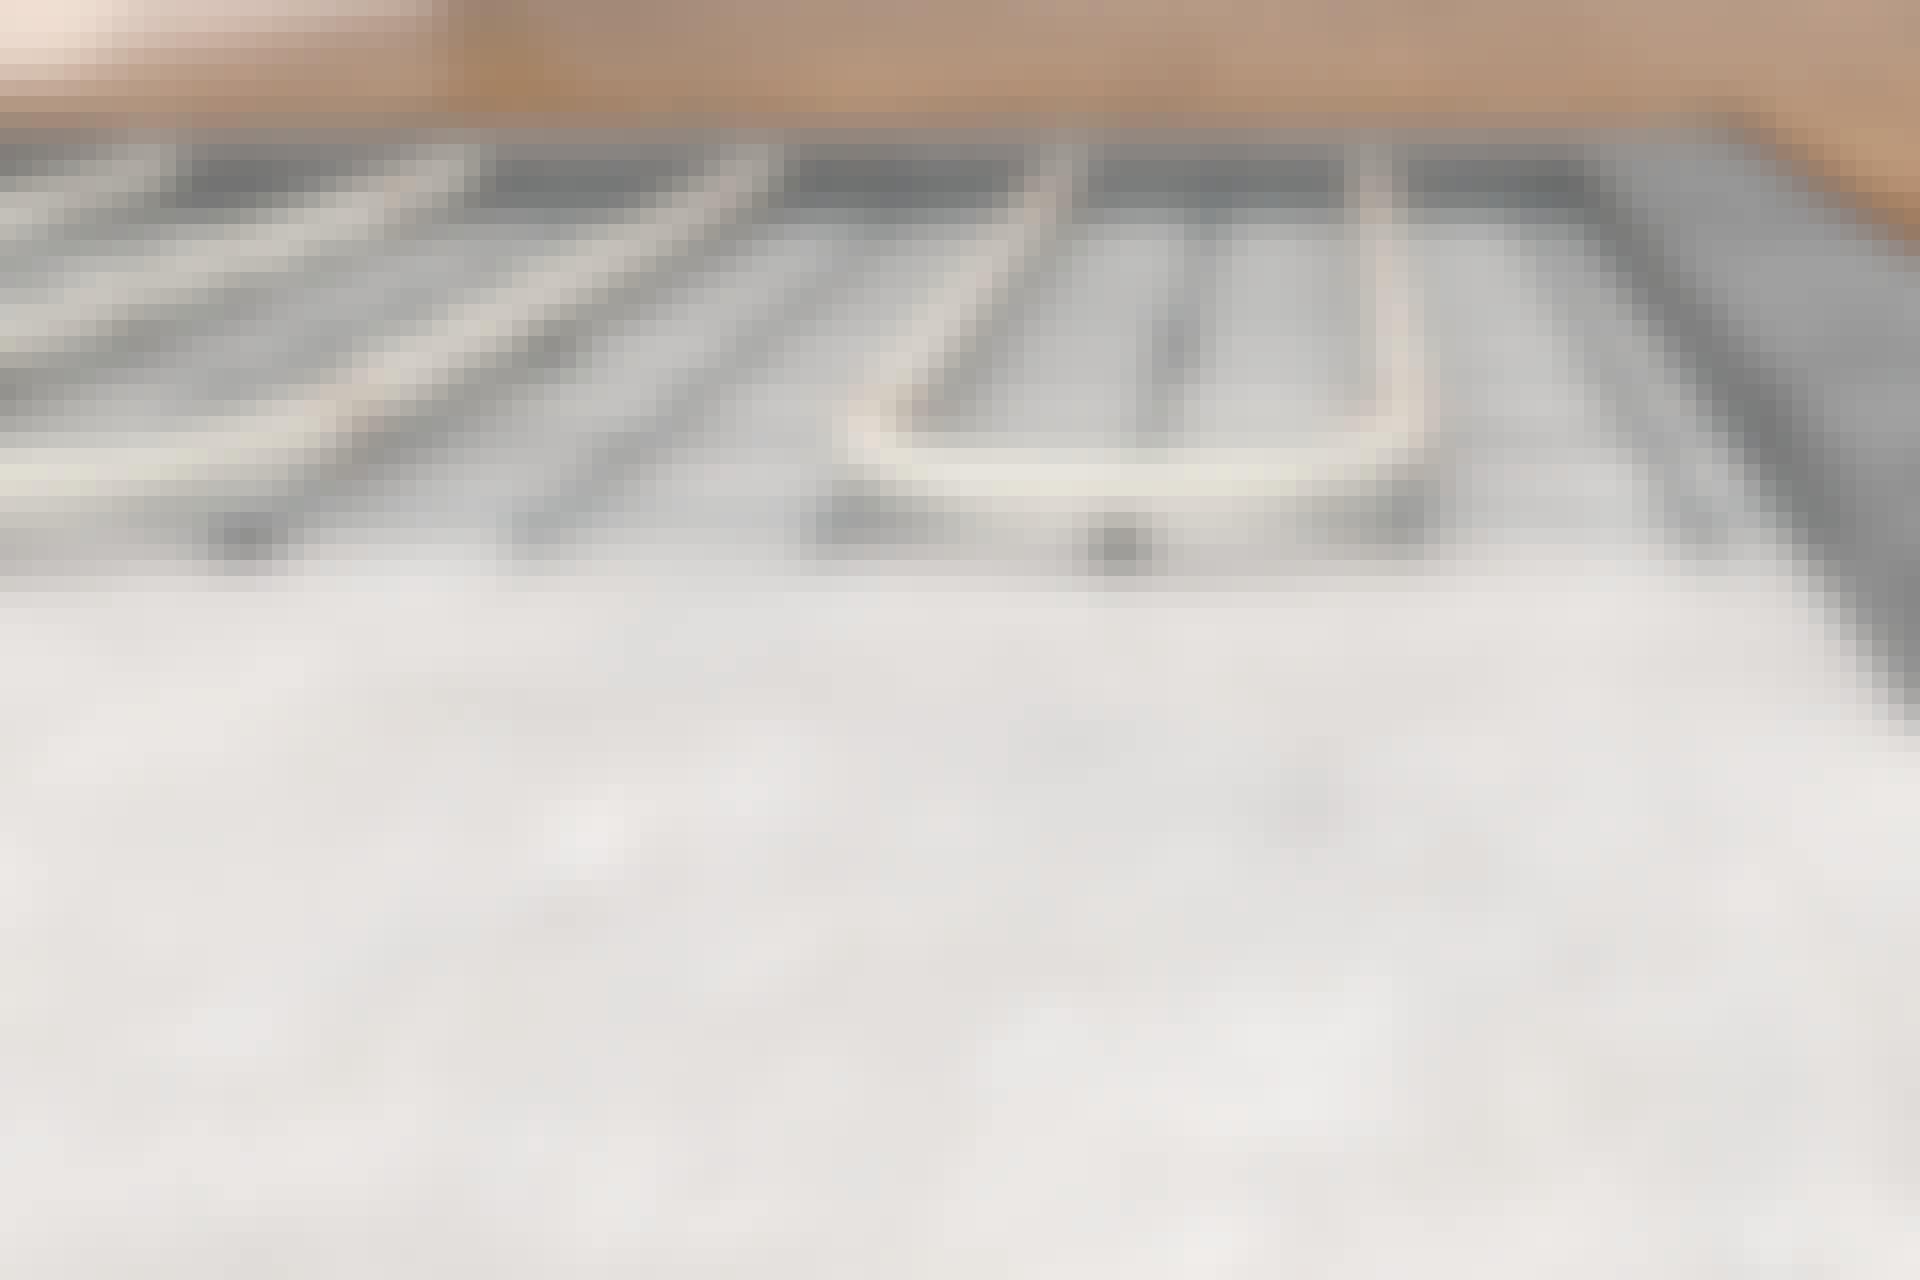 Gulvvarme: Vannbåren eller elektrisk gulvvarme?